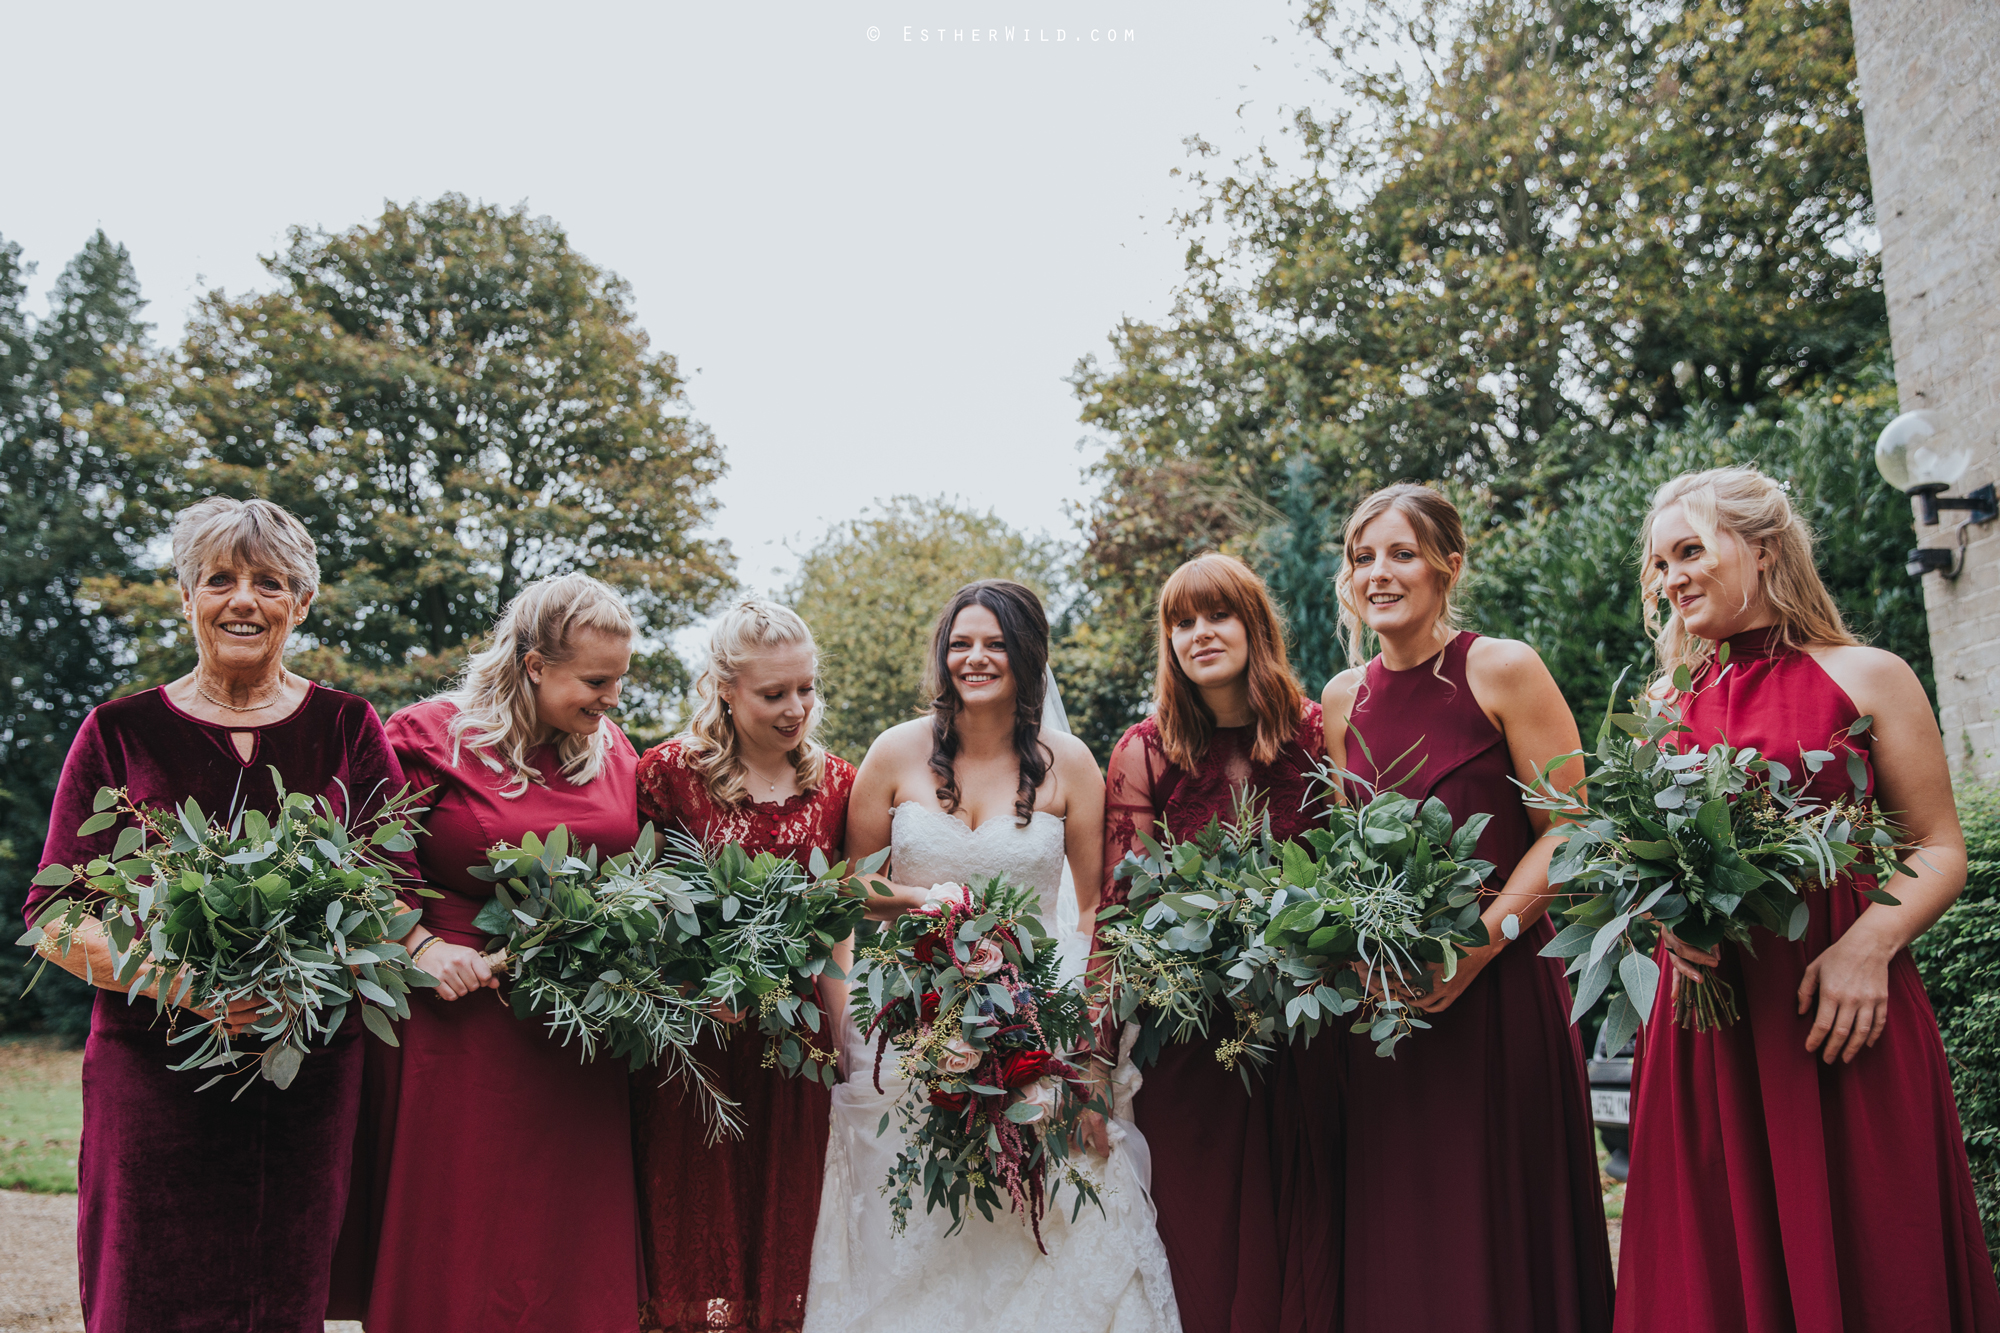 1017_Reading_Room_Weddings_Alby_Norwich_Photographer_Esther_Wild_IMG_0787.jpg